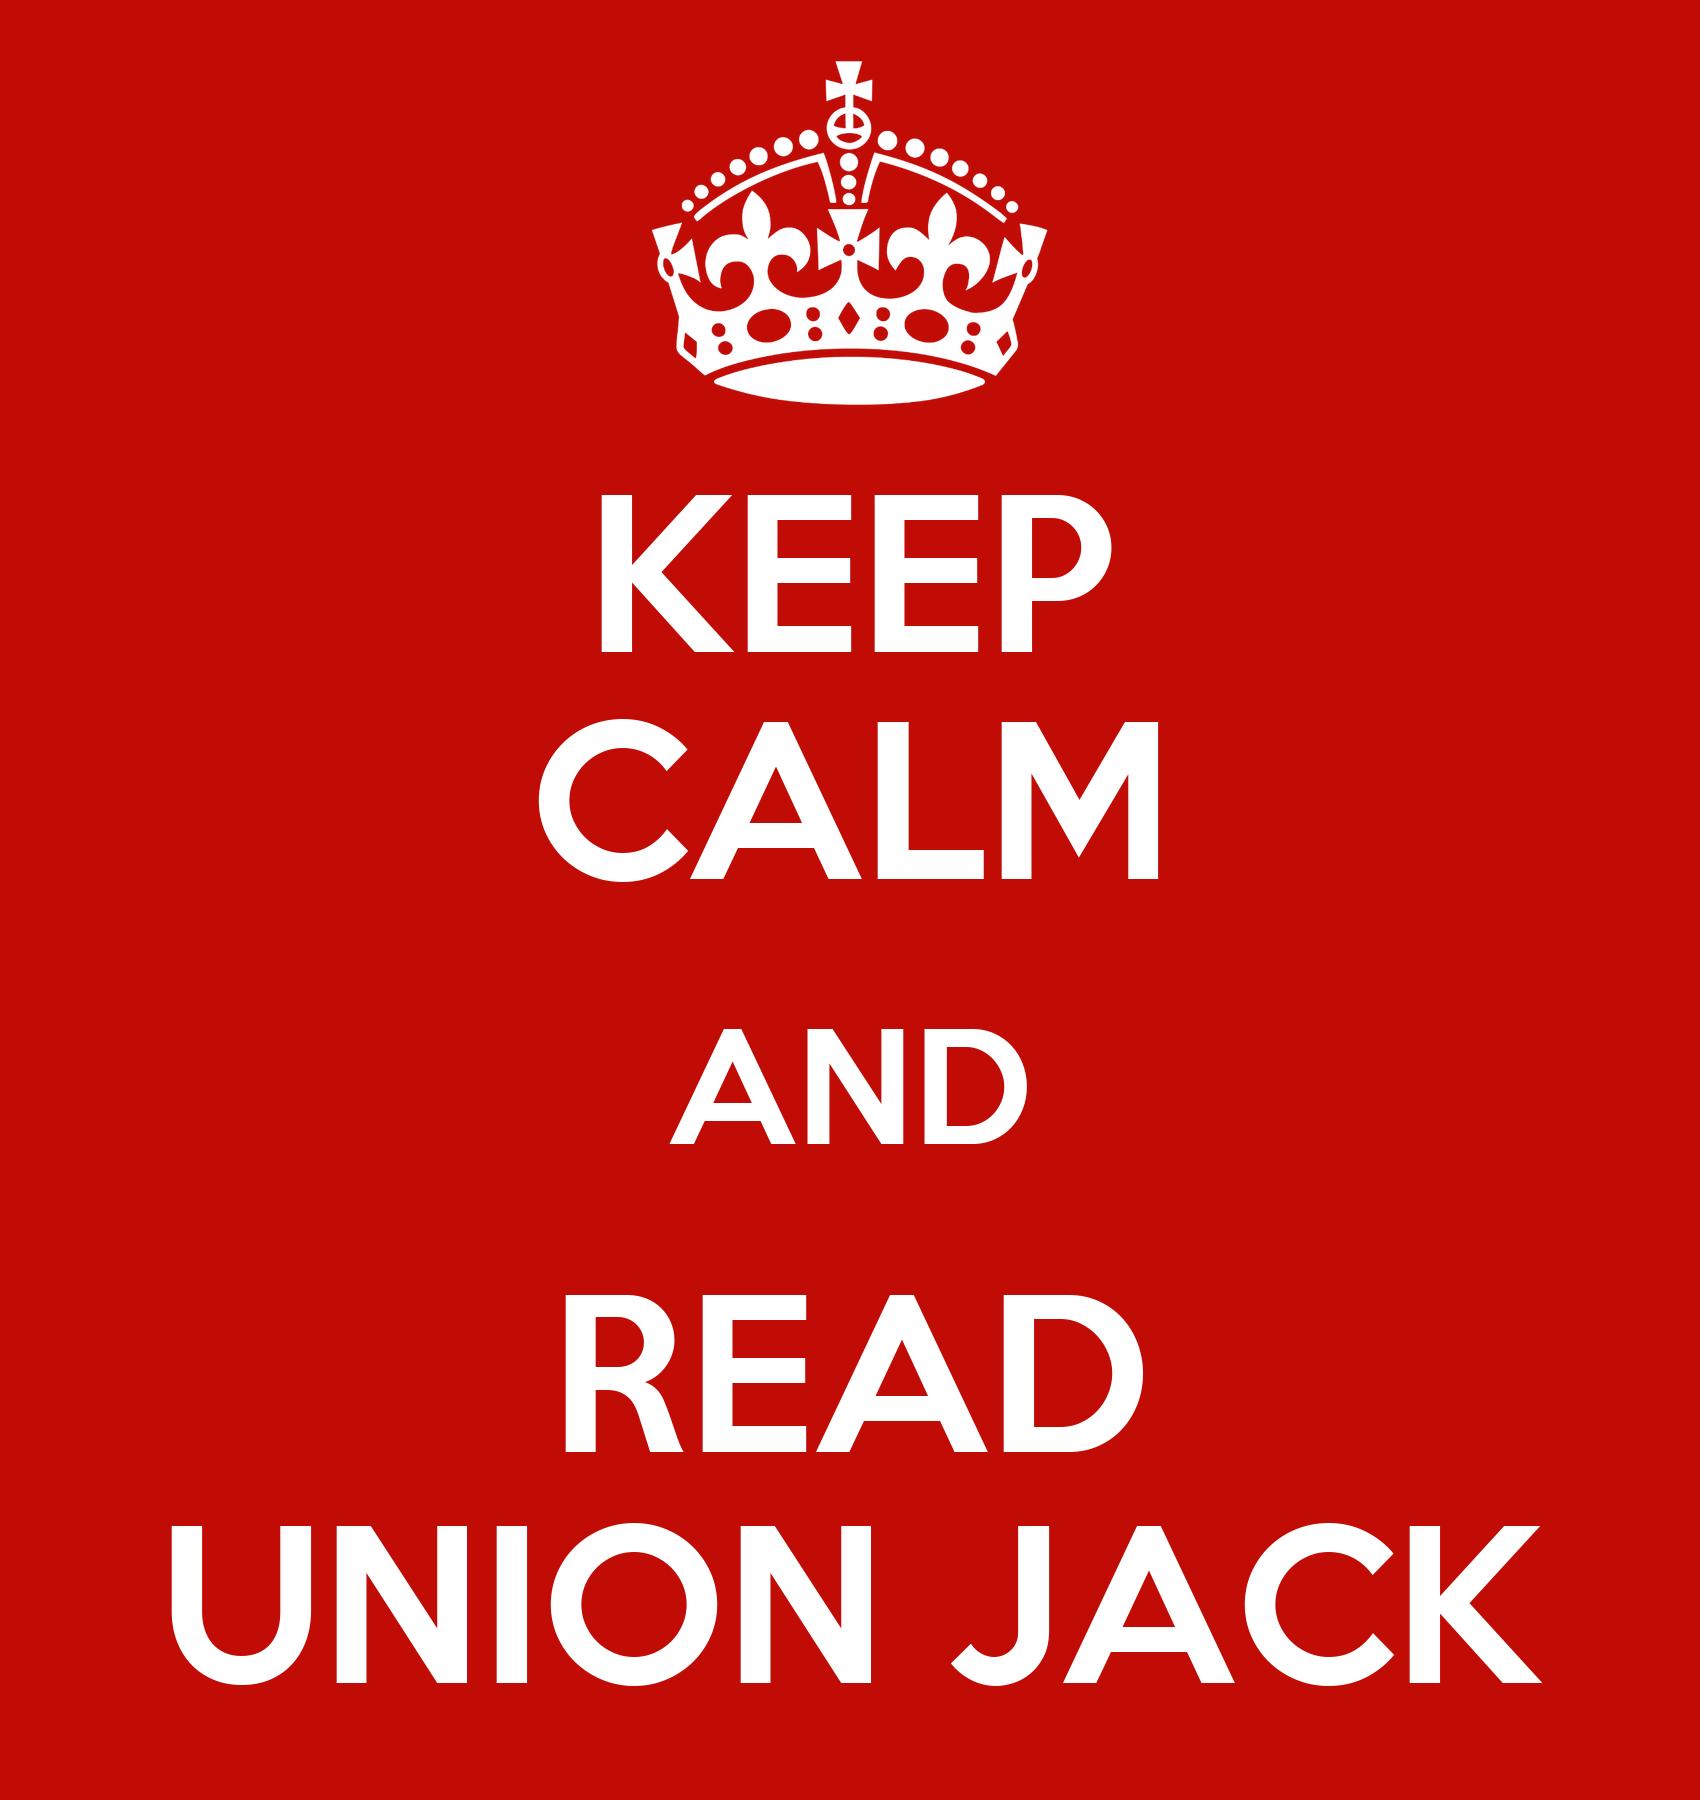 keep calm and read union jack poster union jack keep calm o matic. Black Bedroom Furniture Sets. Home Design Ideas